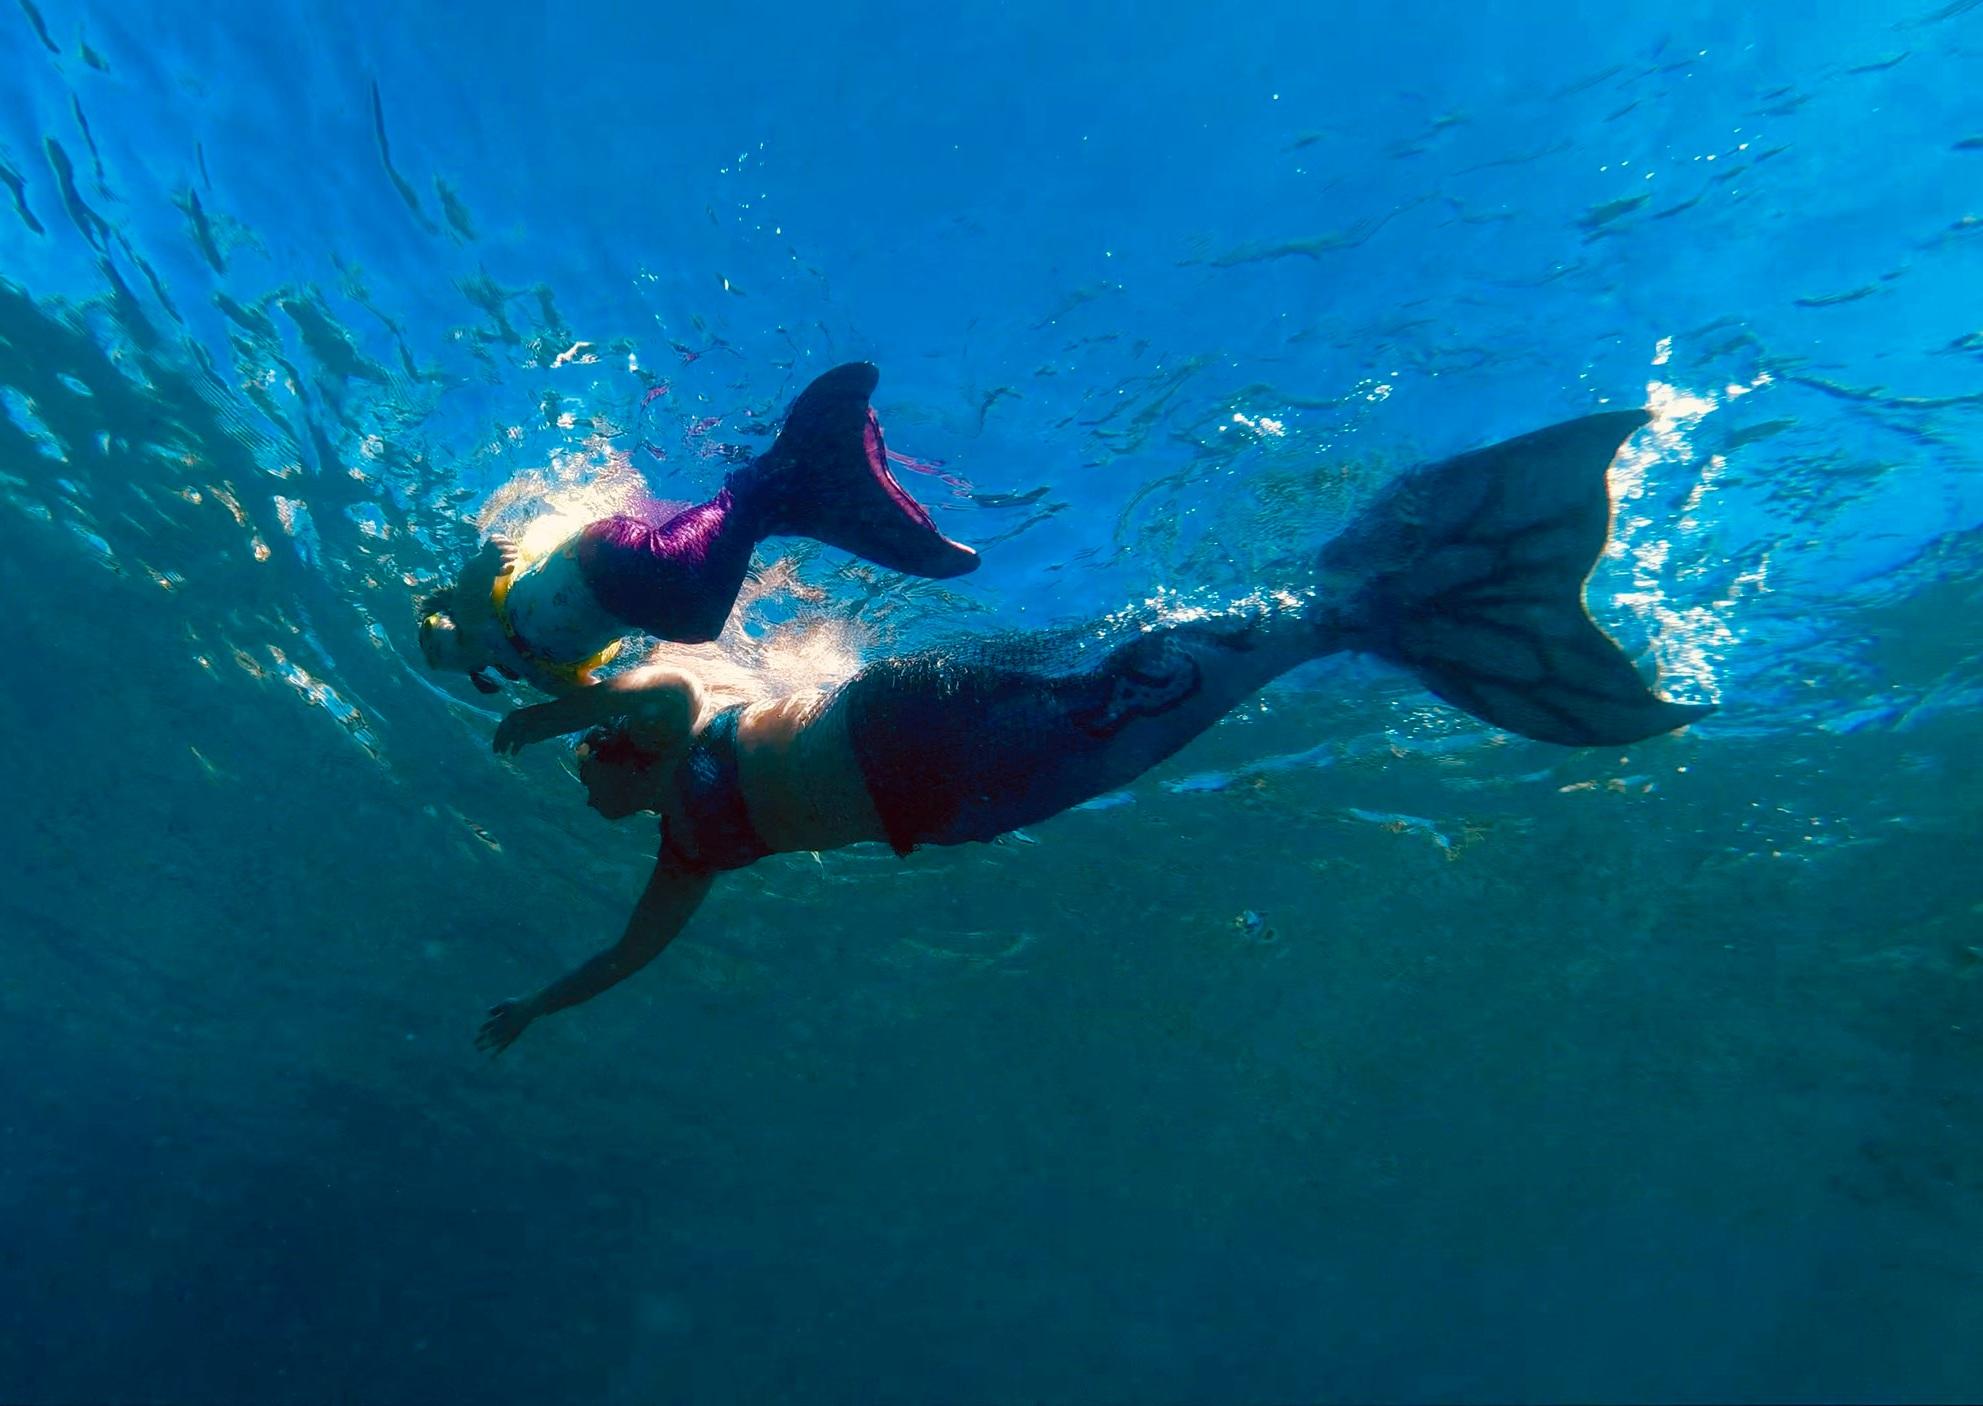 Private Mermaid Lesson - $199